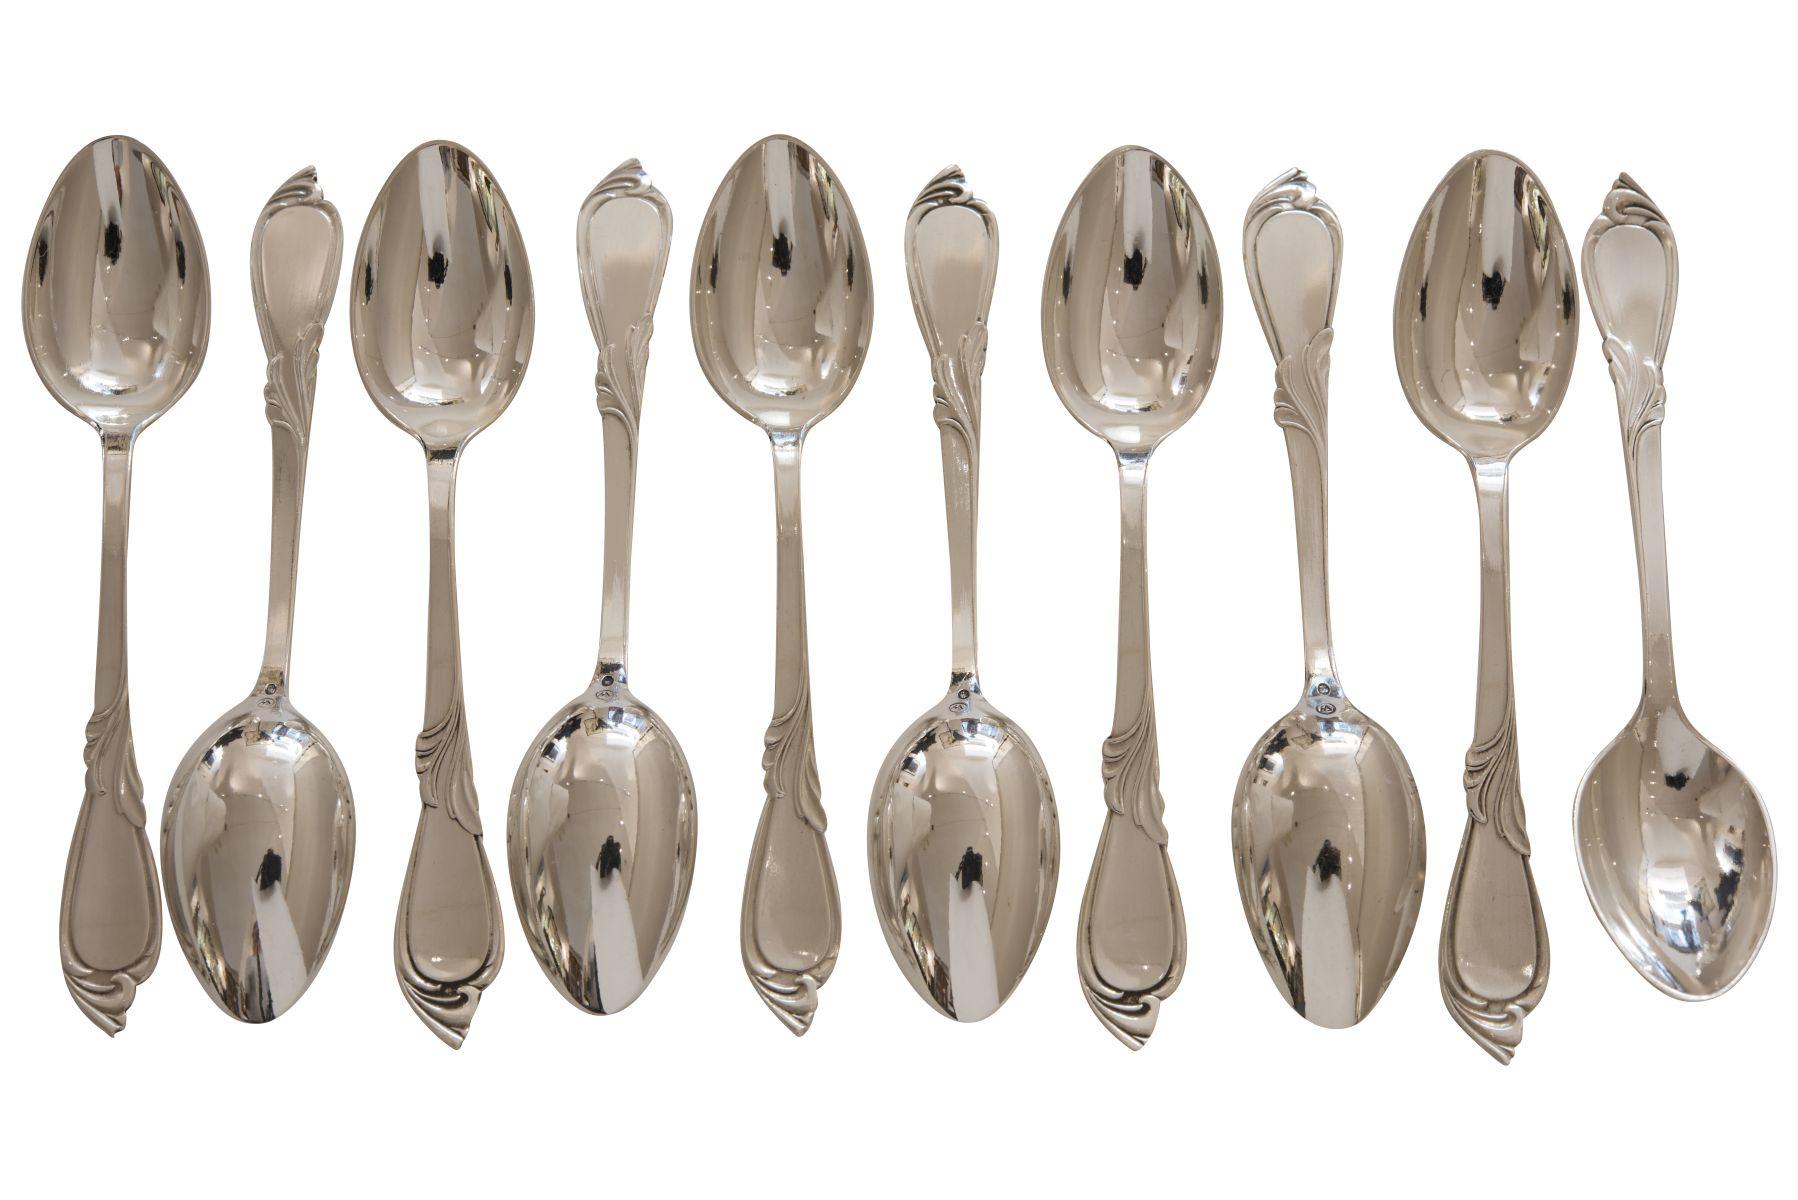 #56 Mocha spoon | 10 Mokkalöffel Image